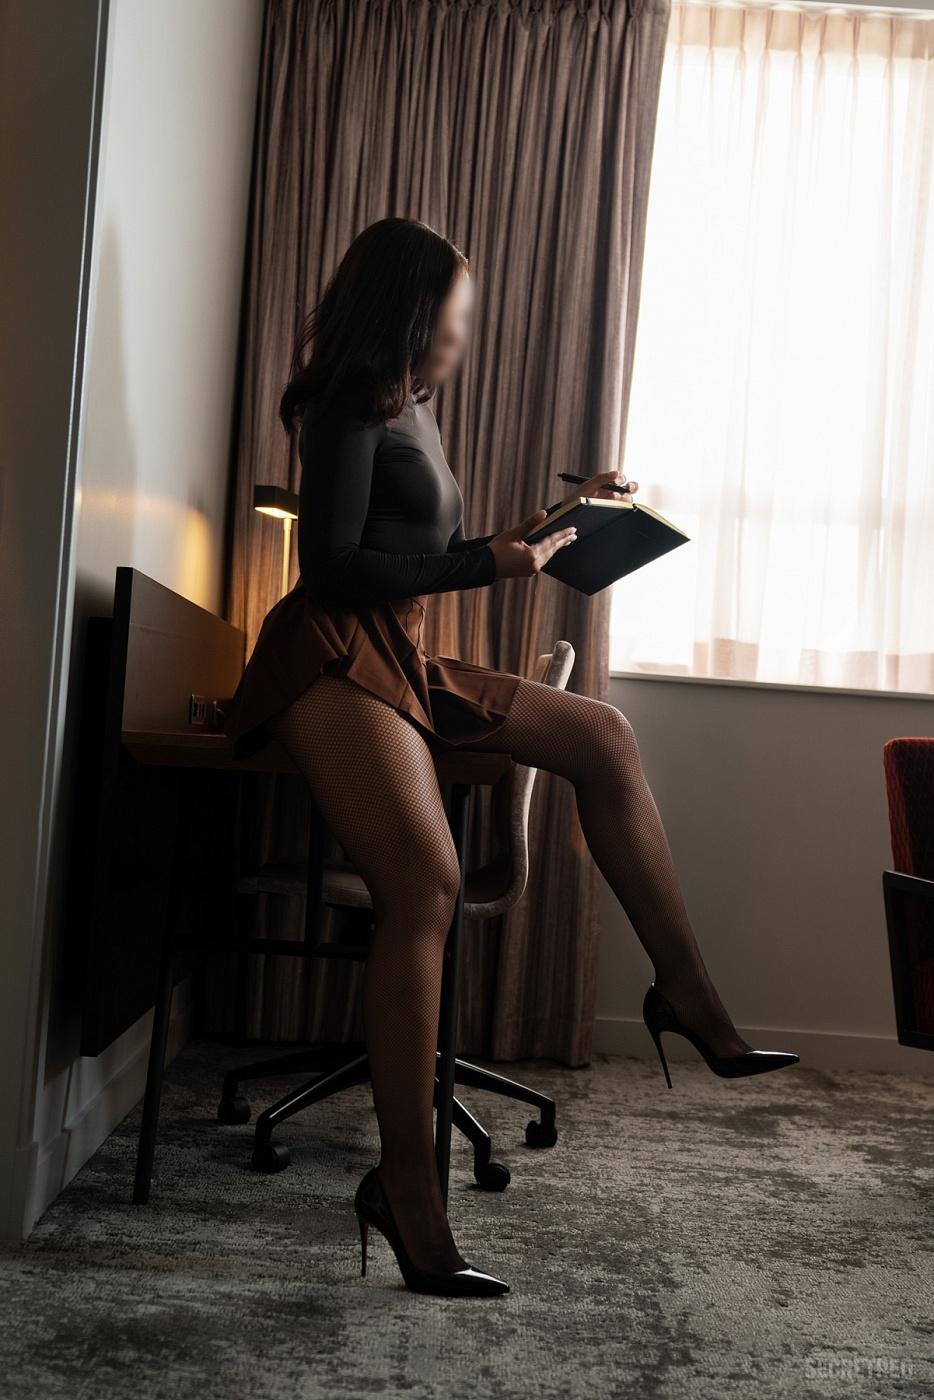 Diana Cruz